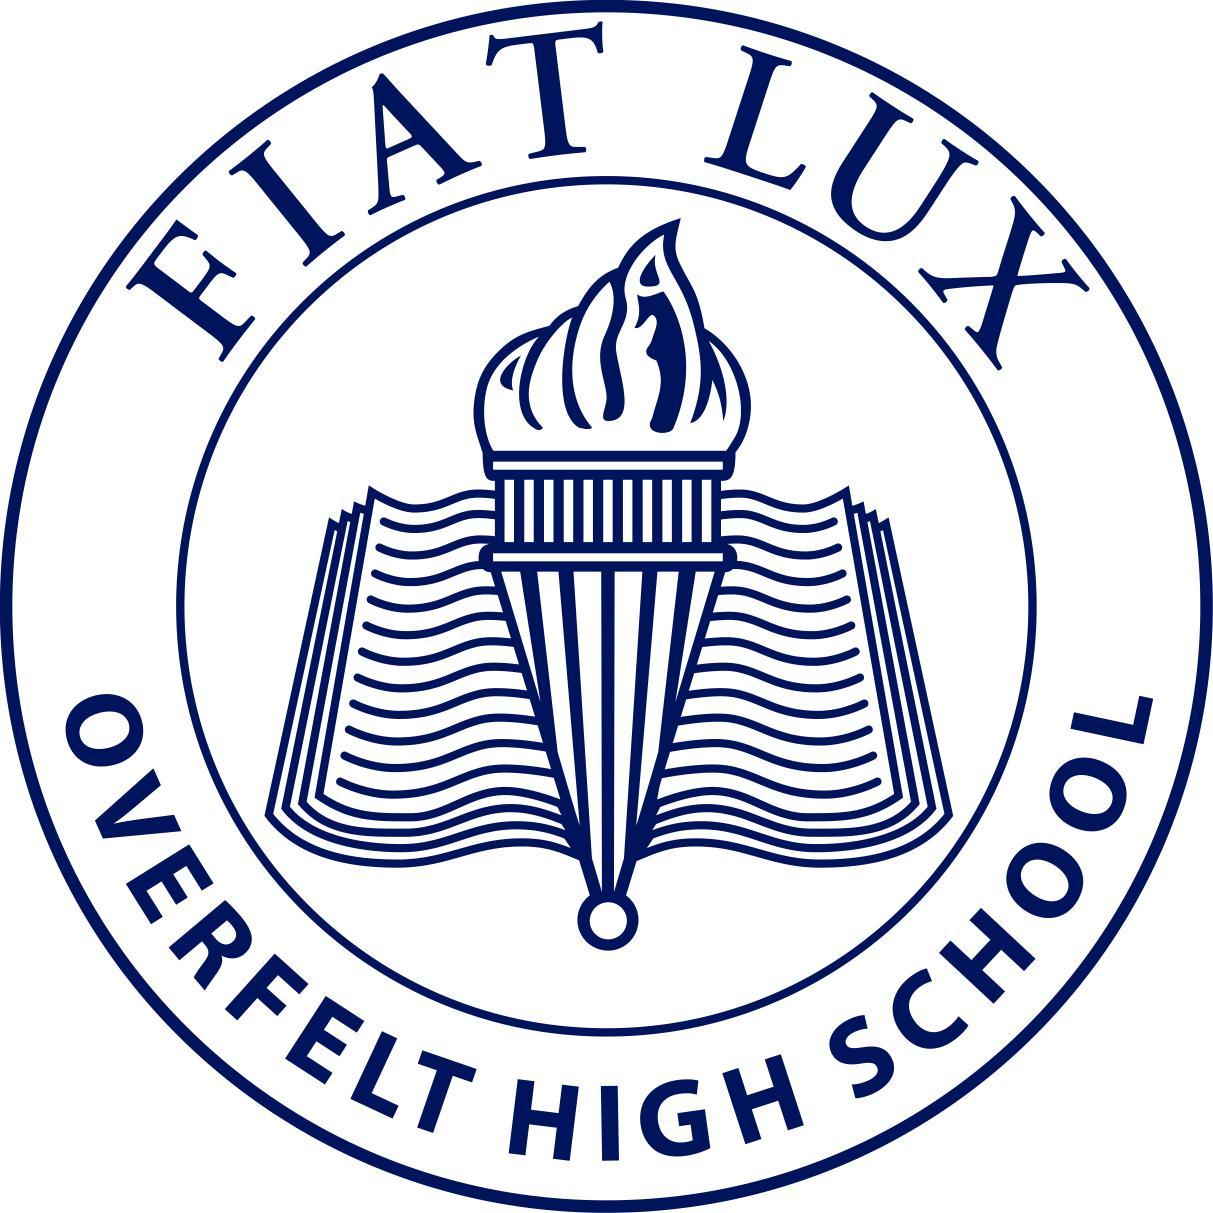 Mr. Douglas Day  - Fiat Lux